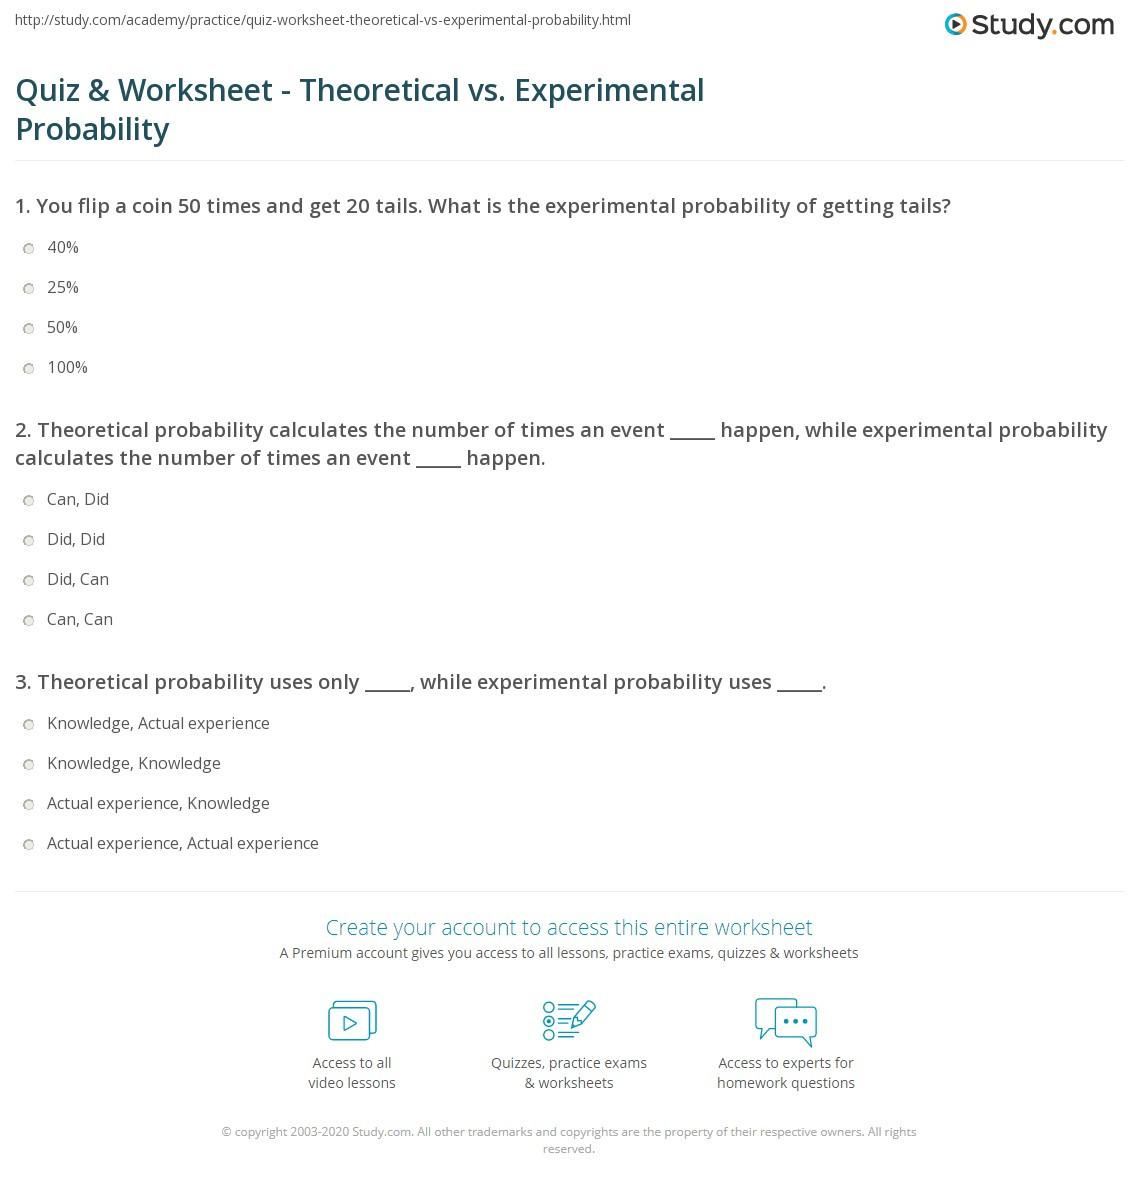 Quiz & Worksheet Theoretical vs Experimental Probability